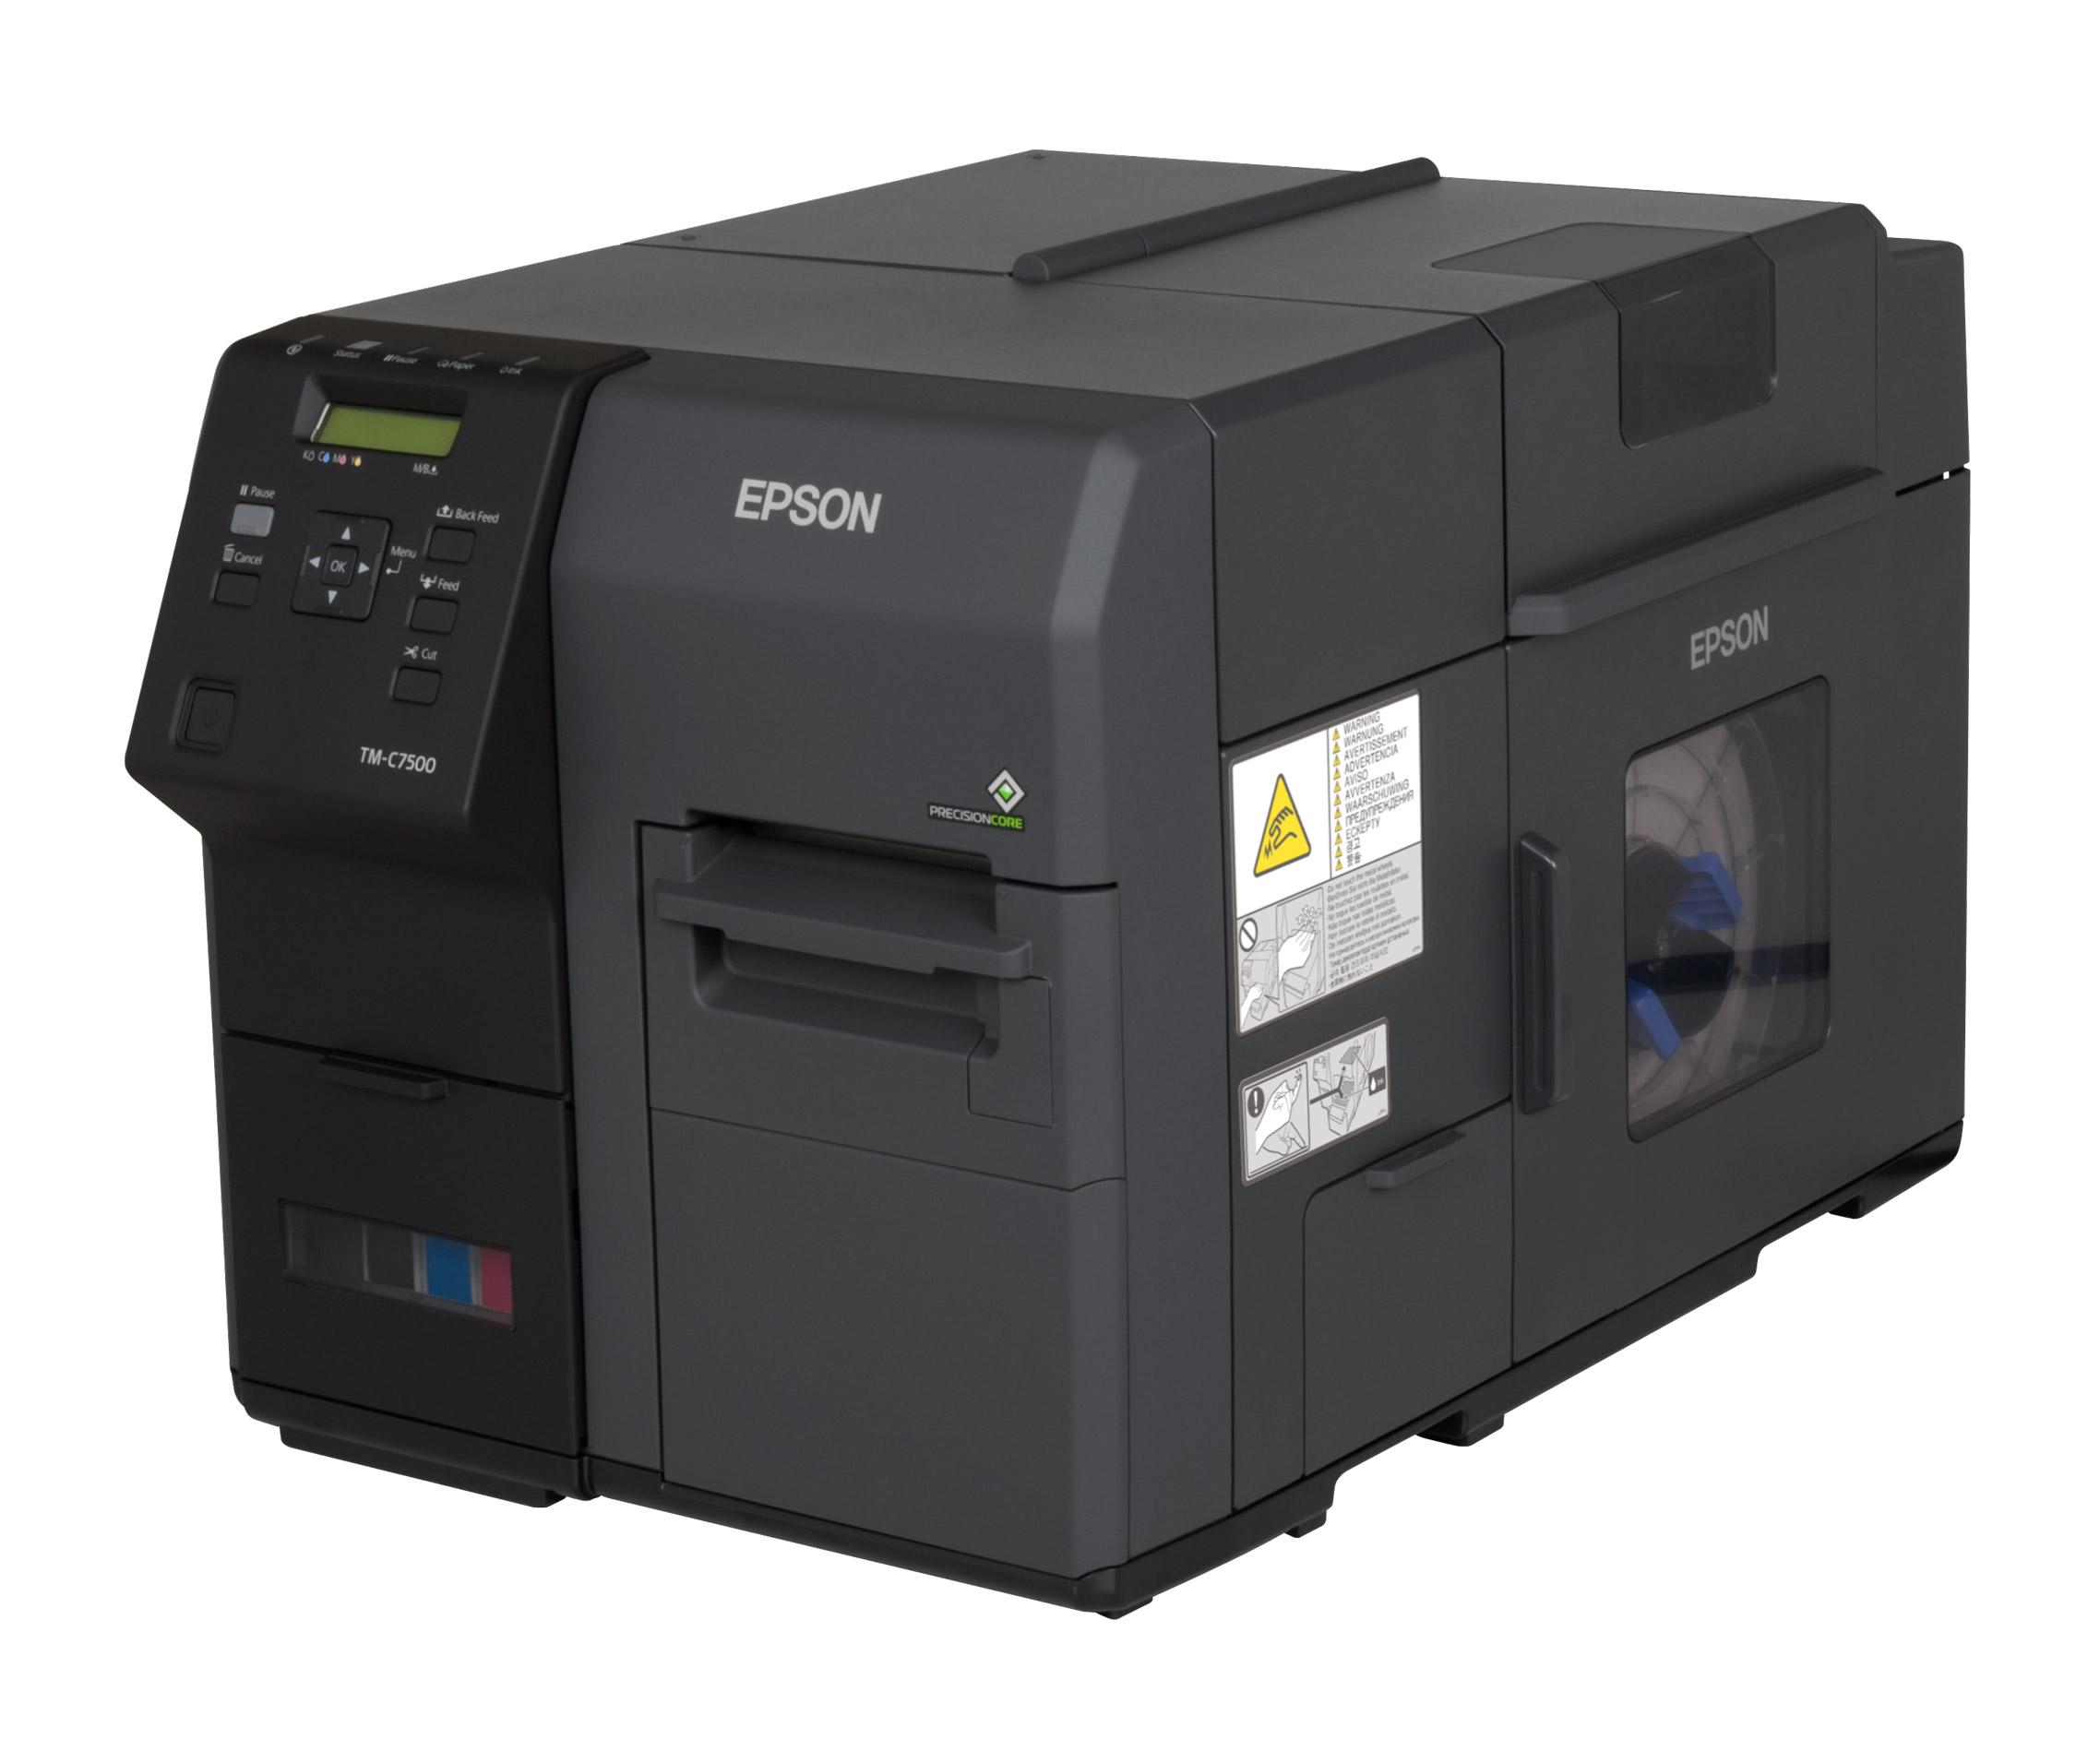 Epson ColorWorks C7500 industrieller Farbetikettendrucker